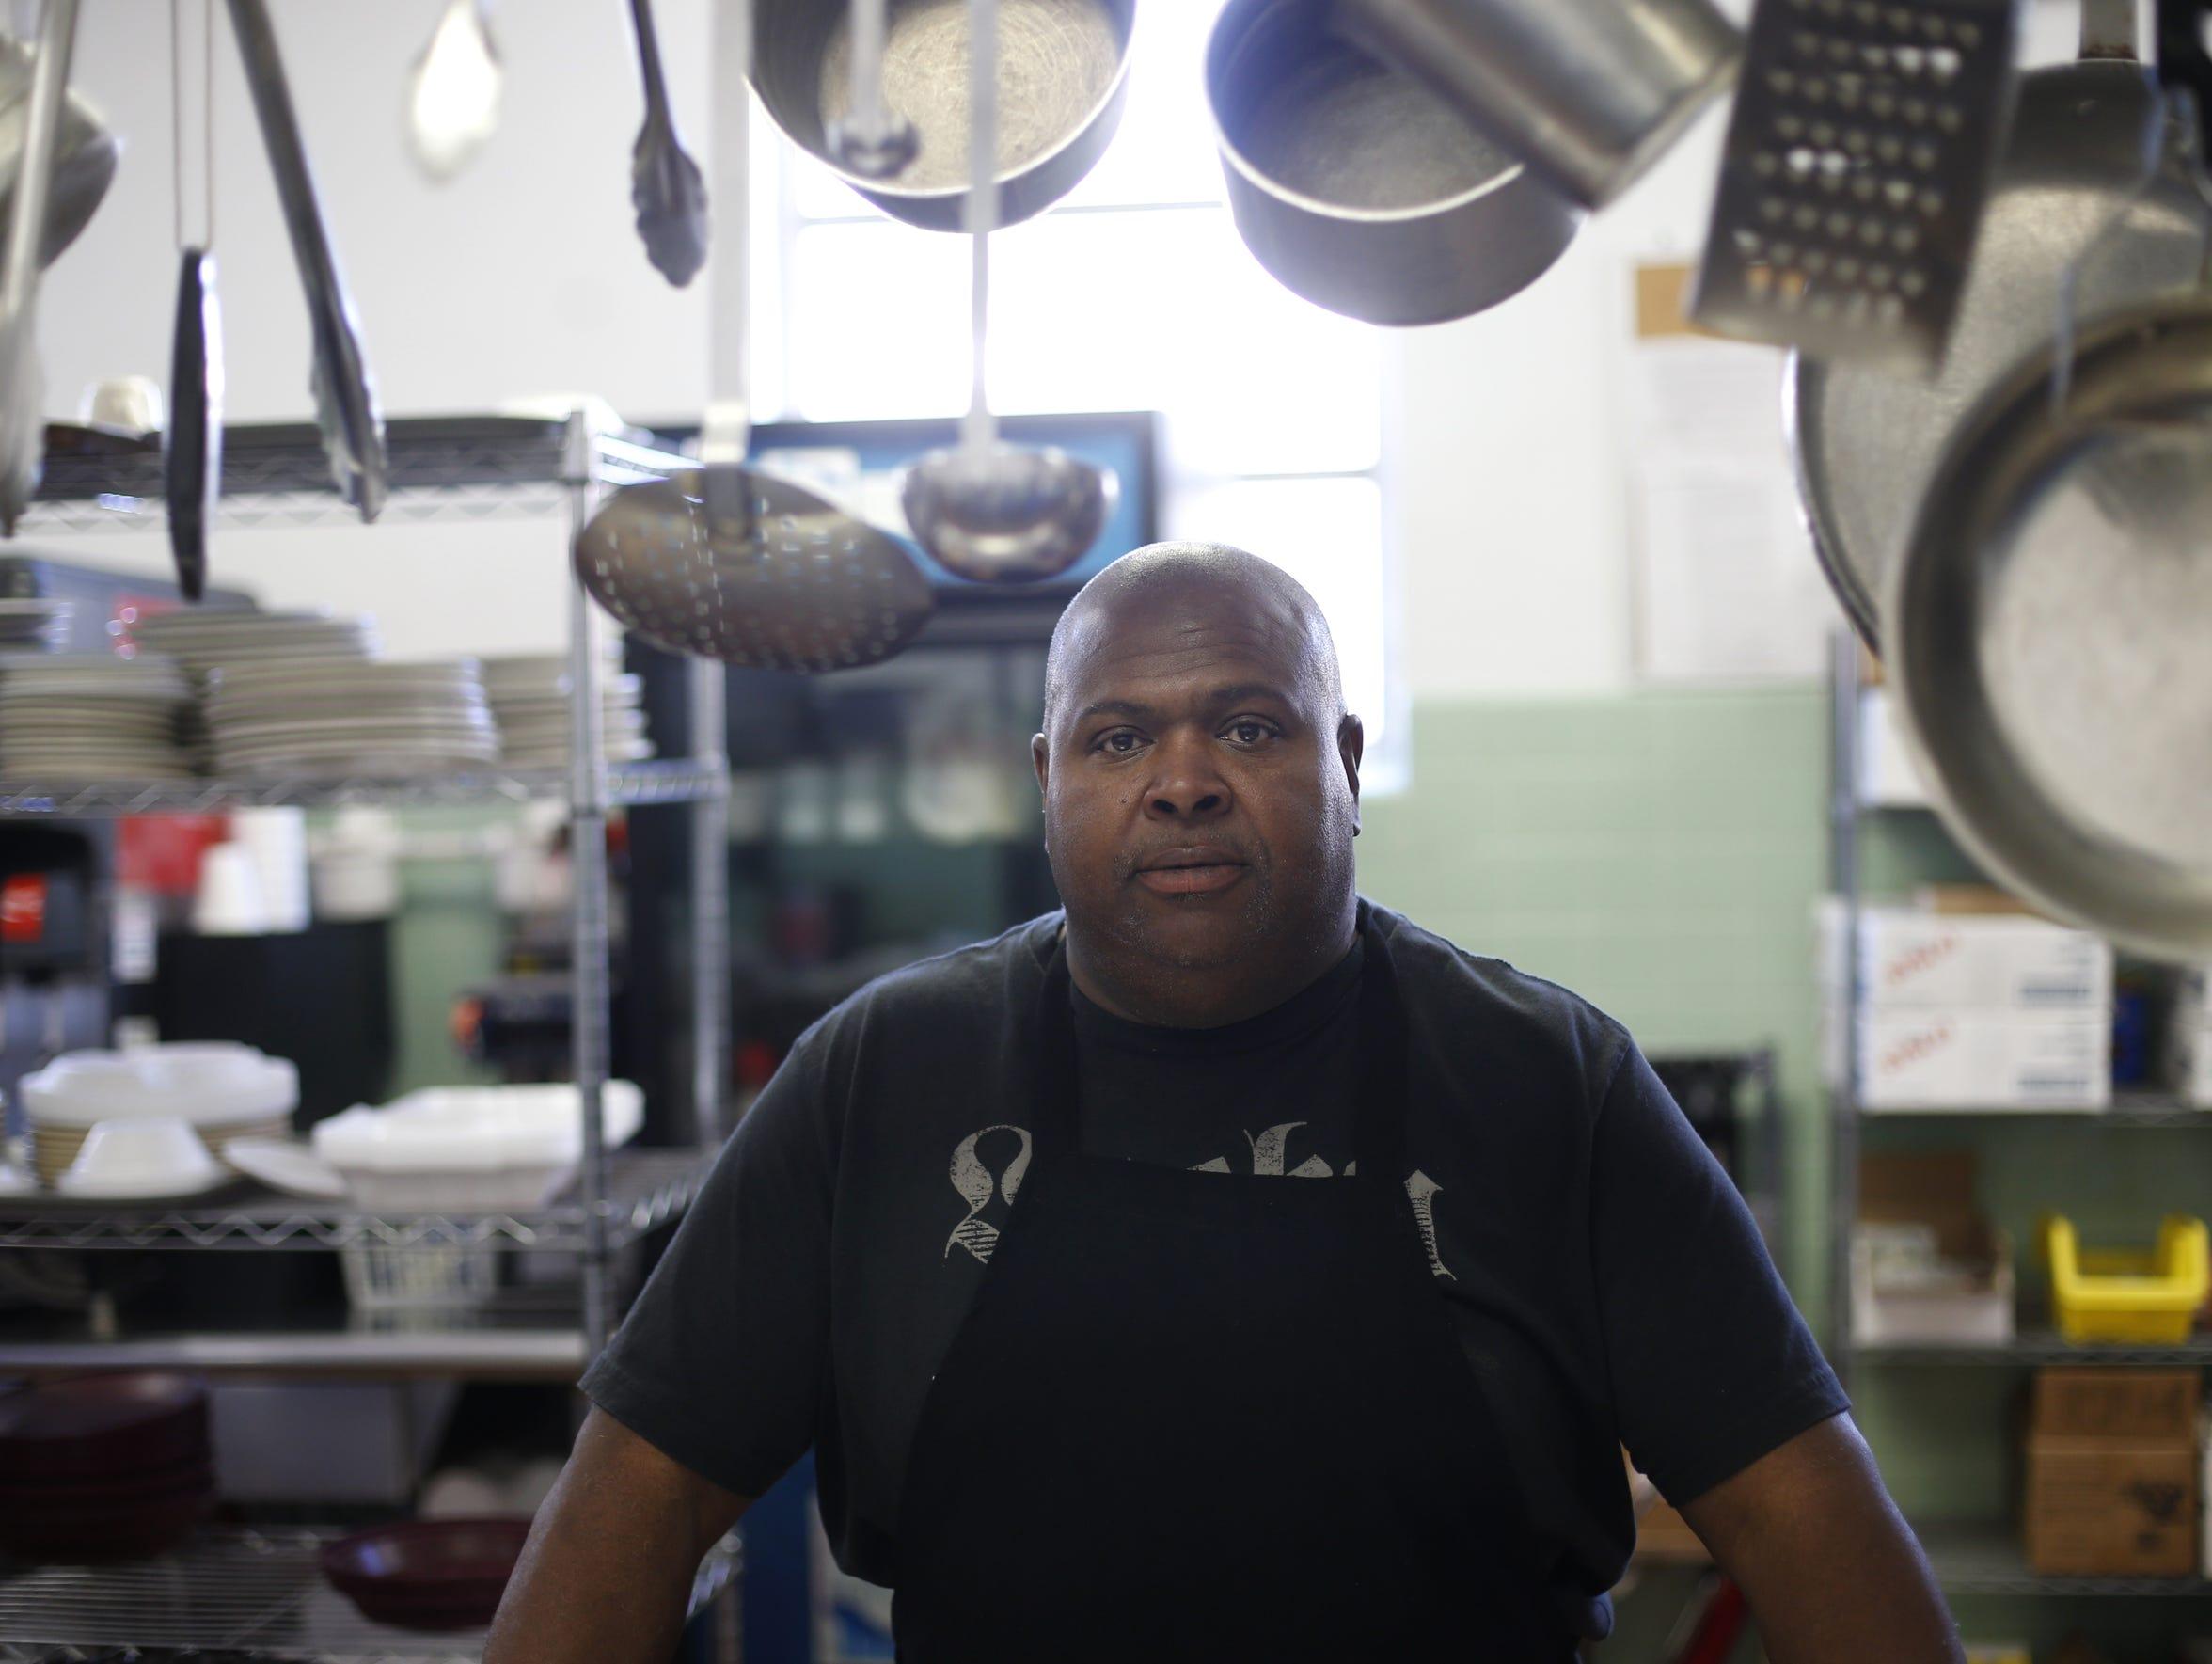 Sam Davis, the dietary manager at Calhoun Liberty Hospital